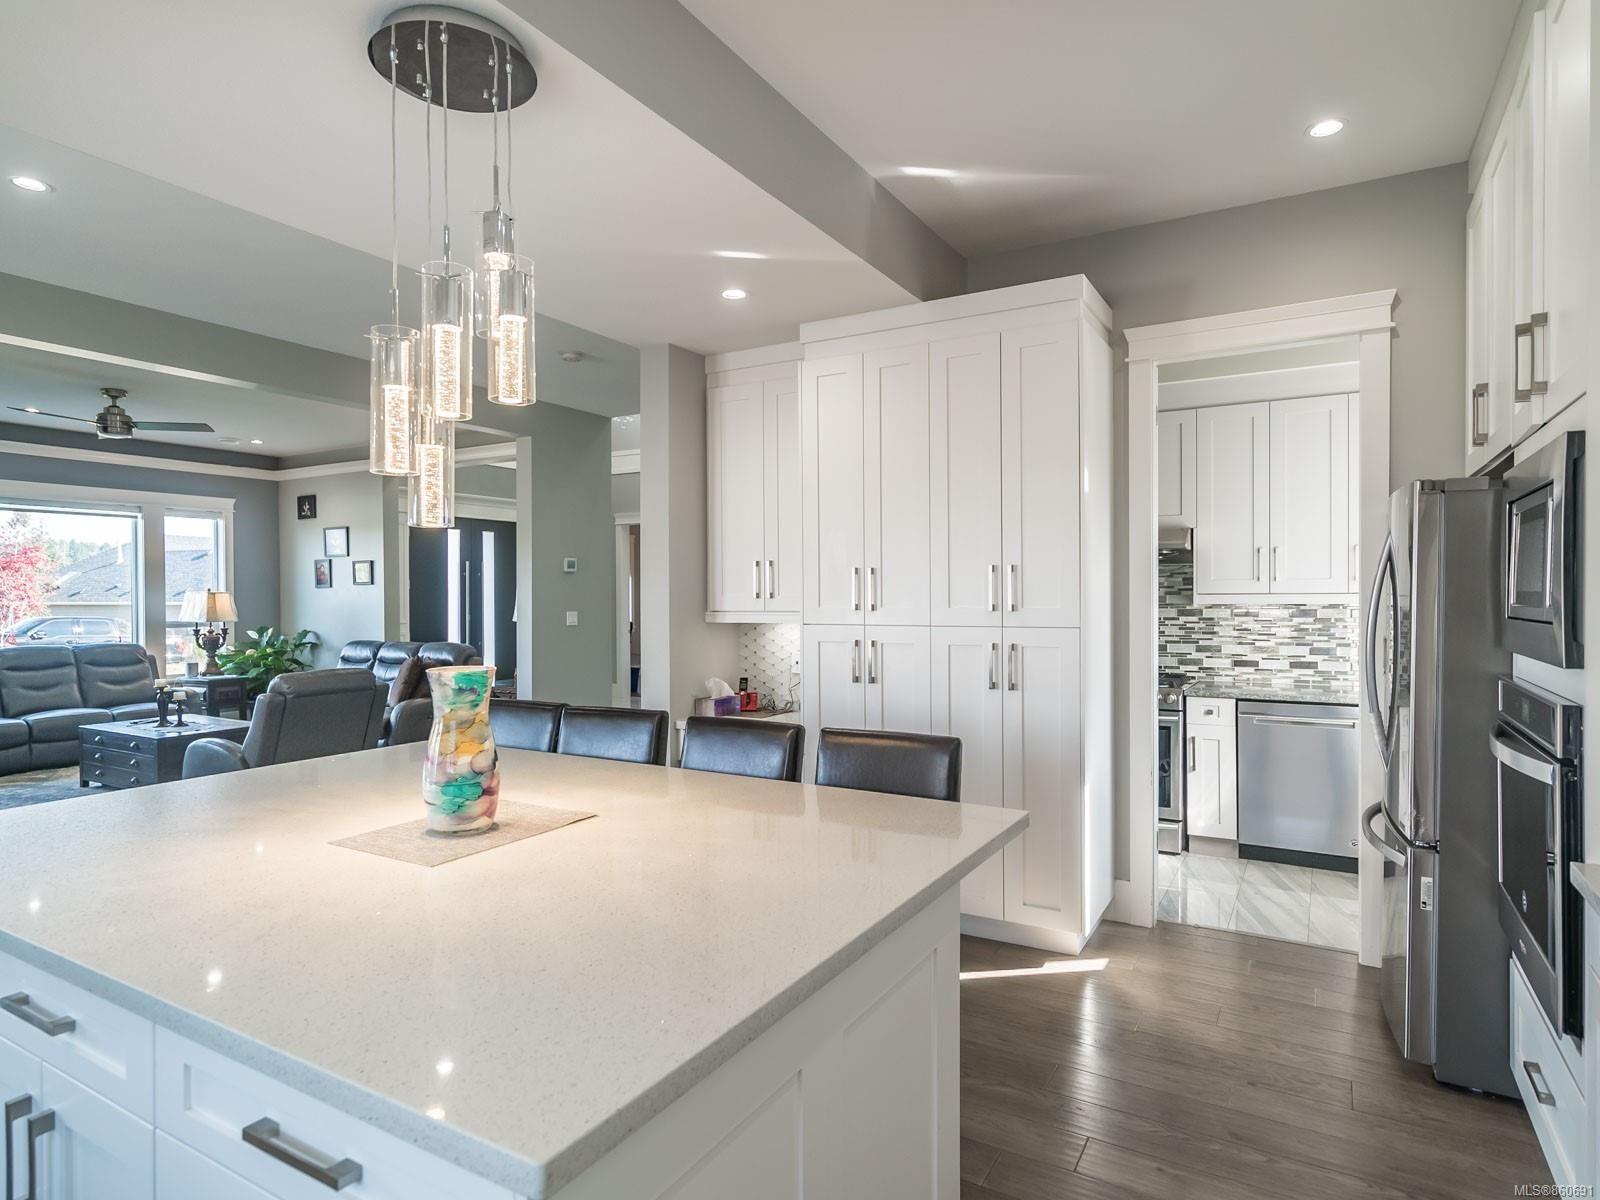 Photo 15: Photos: 5821 Linley Valley Dr in : Na North Nanaimo House for sale (Nanaimo)  : MLS®# 860691